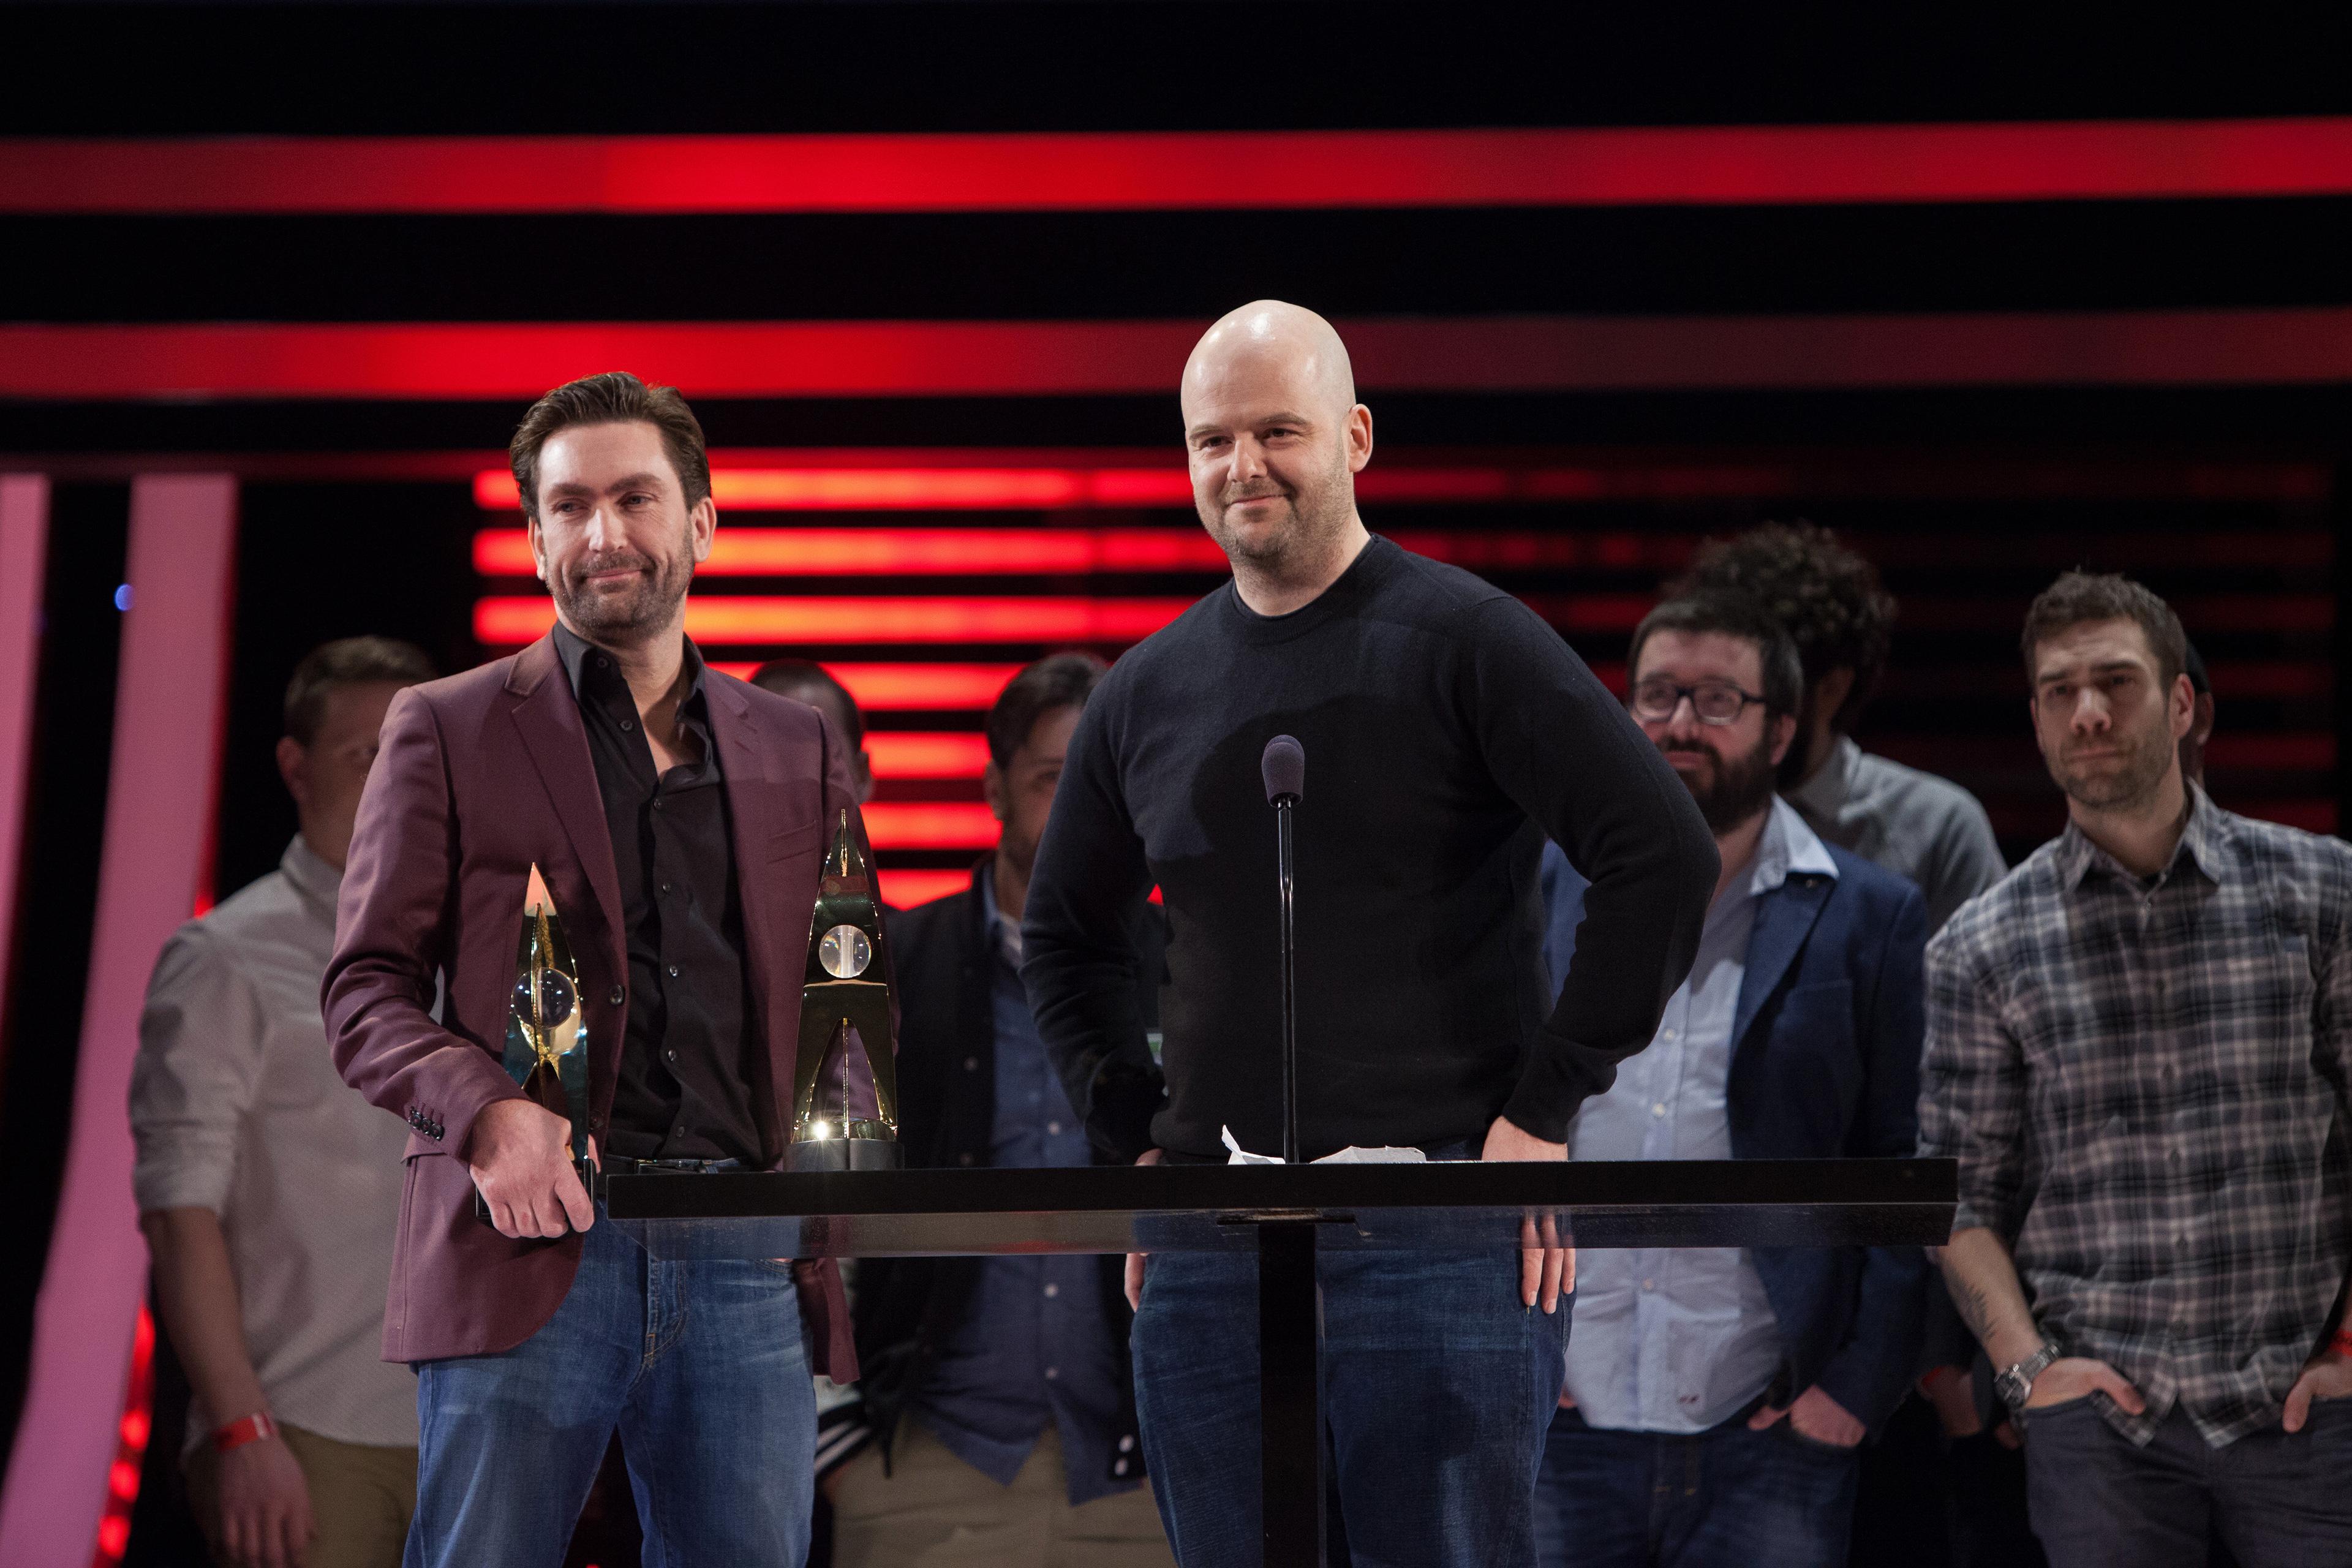 photo of Leslie Benzies and Dan Houser behind a podium at DICE 2014